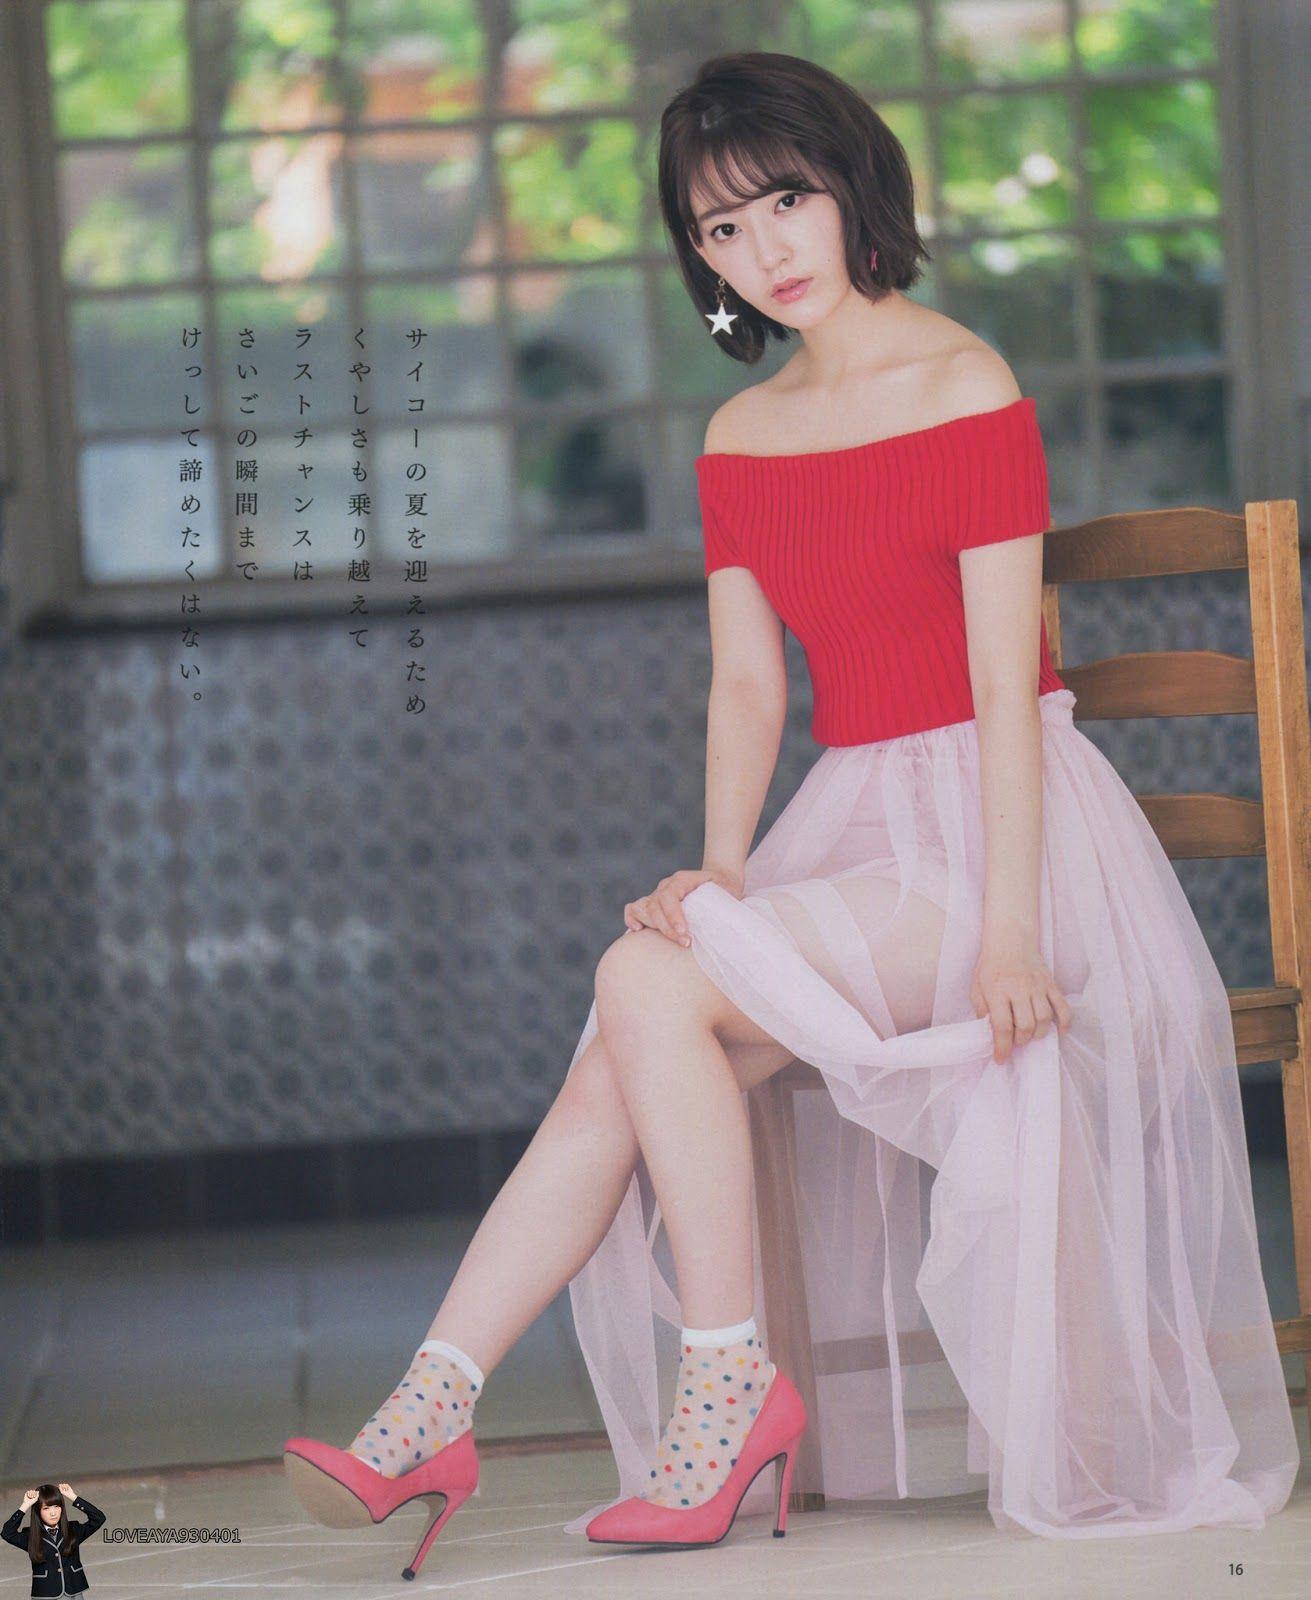 miyawaki sakura 宮脇咲良 bomb 2016 07 ボム 2016年07月号 sakura child actresses kpop girls